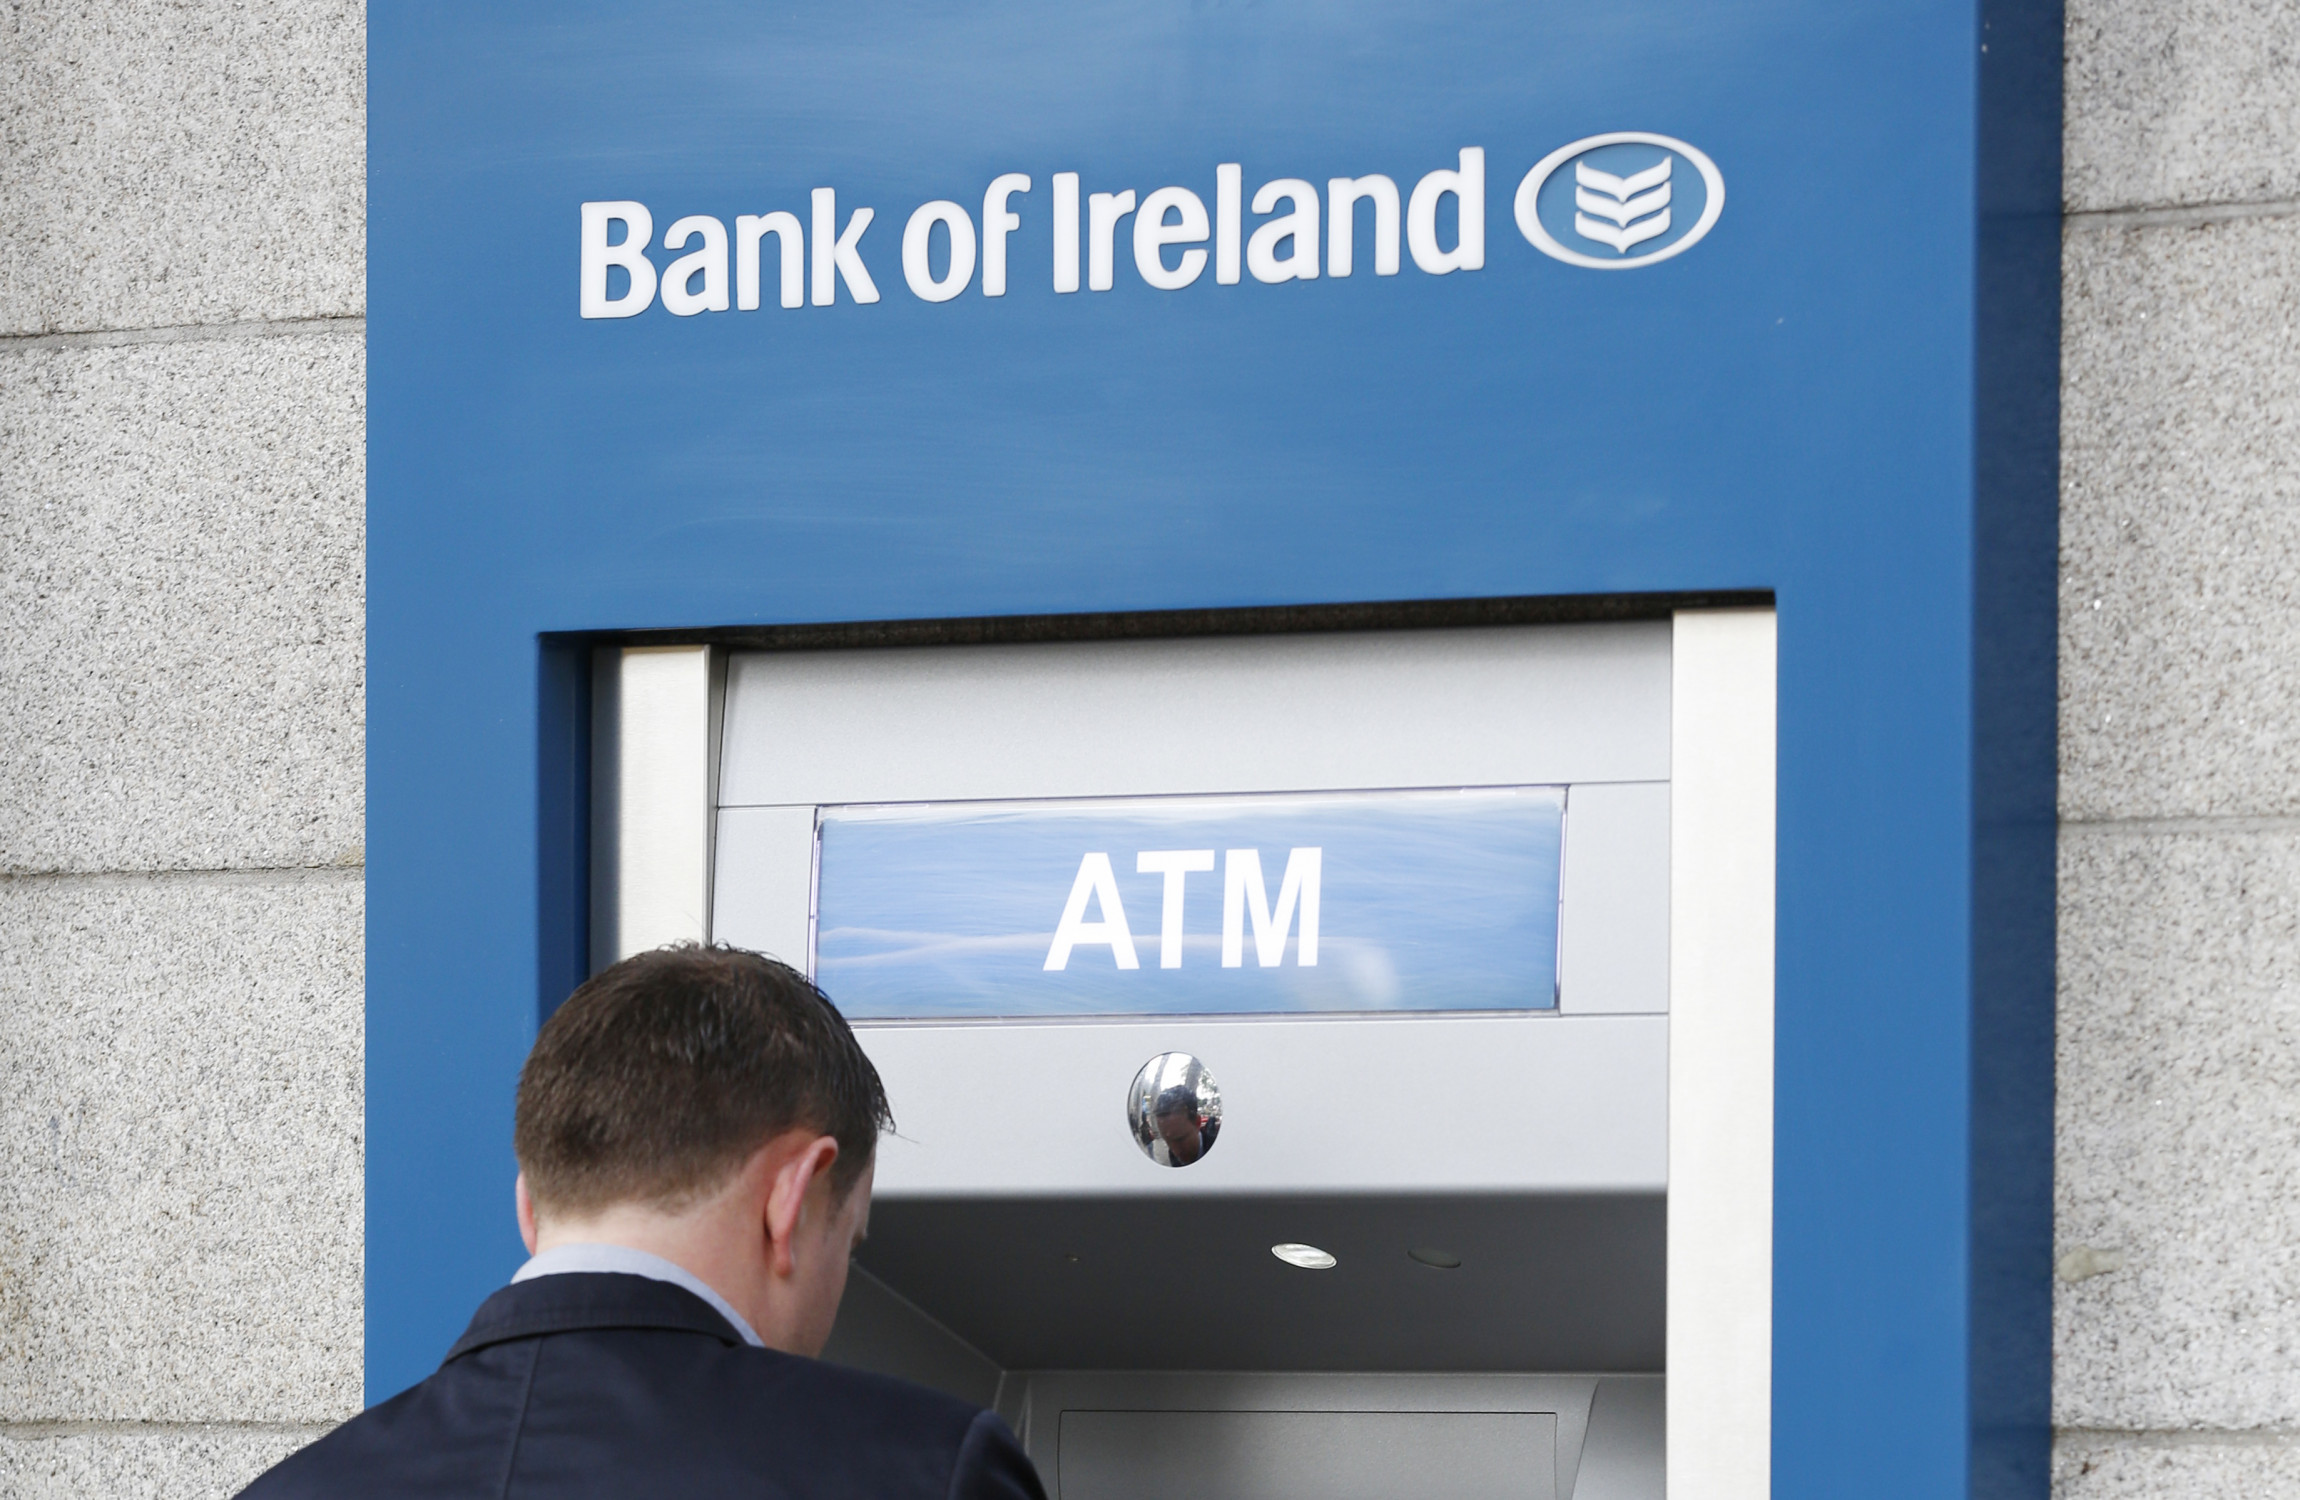 Bank of ireland 365 lost debit card